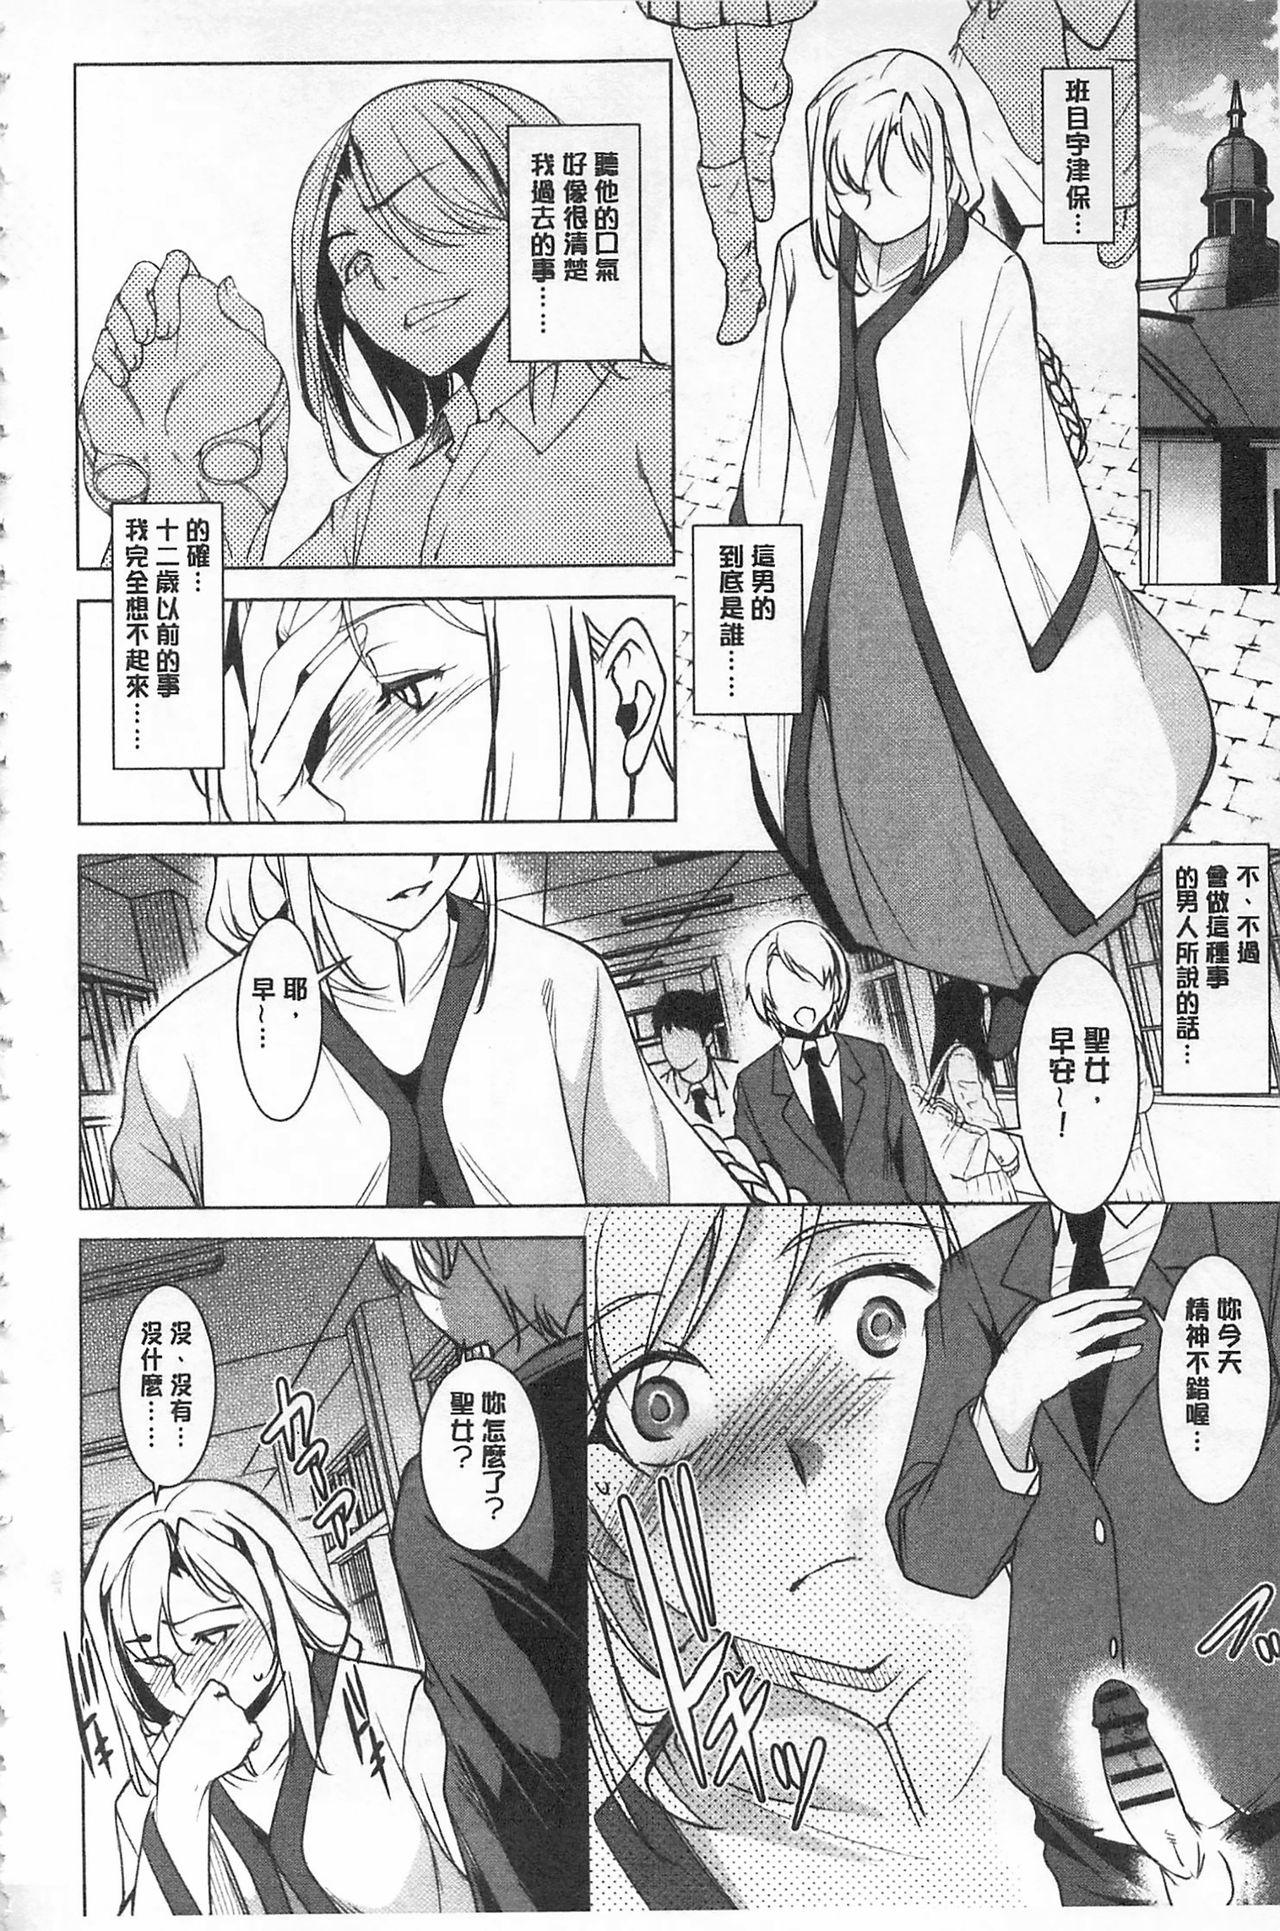 [Amano Kazumi] Seida Inyou -Seijo no Katachi Shita Intou- | 聖墮陰陽 -聖女的容貌與淫蕩- [Chinese] 43